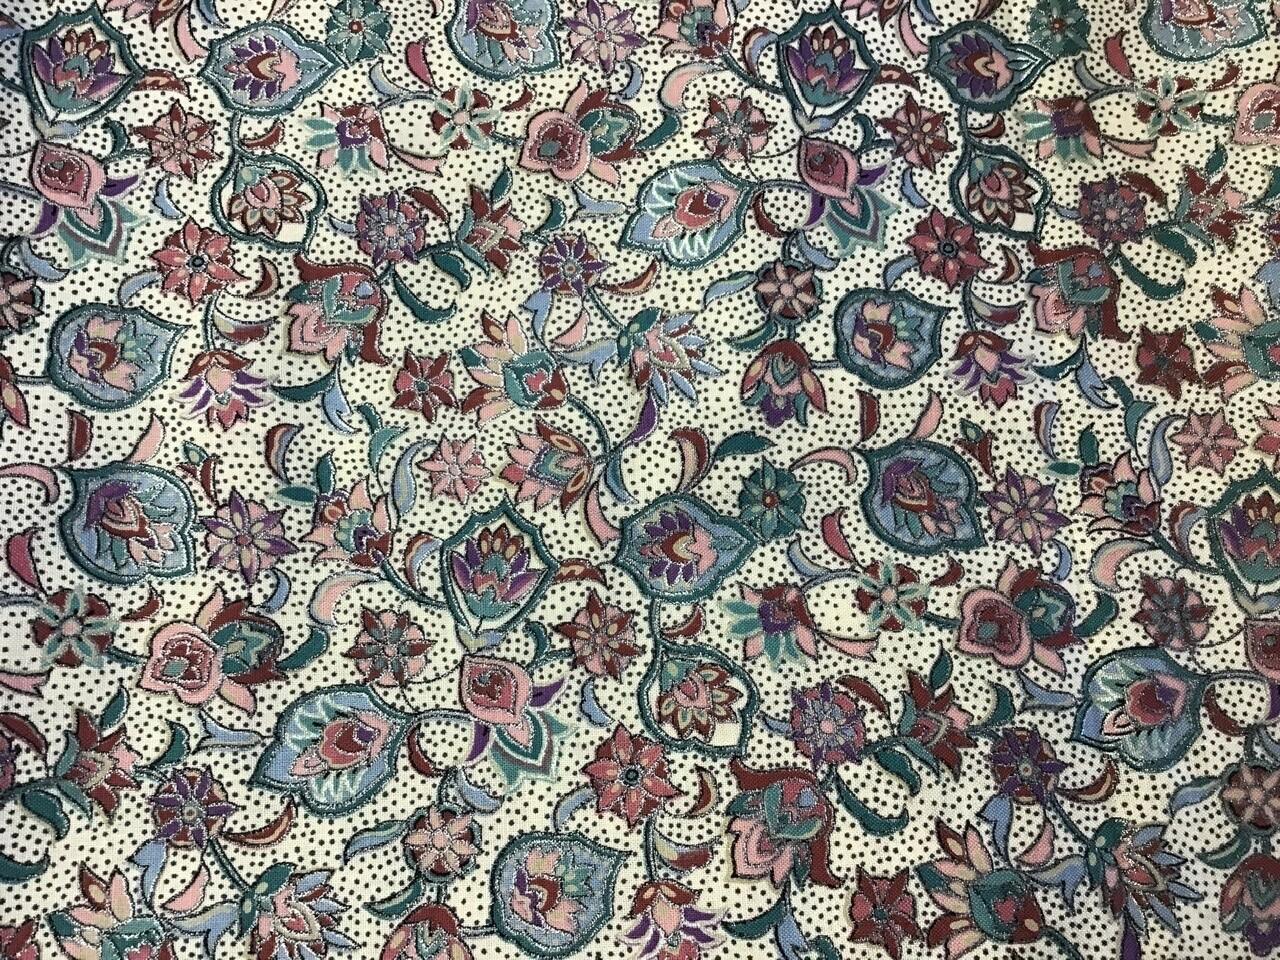 Fabric: Spring Garden (with some metallic) / Cotton